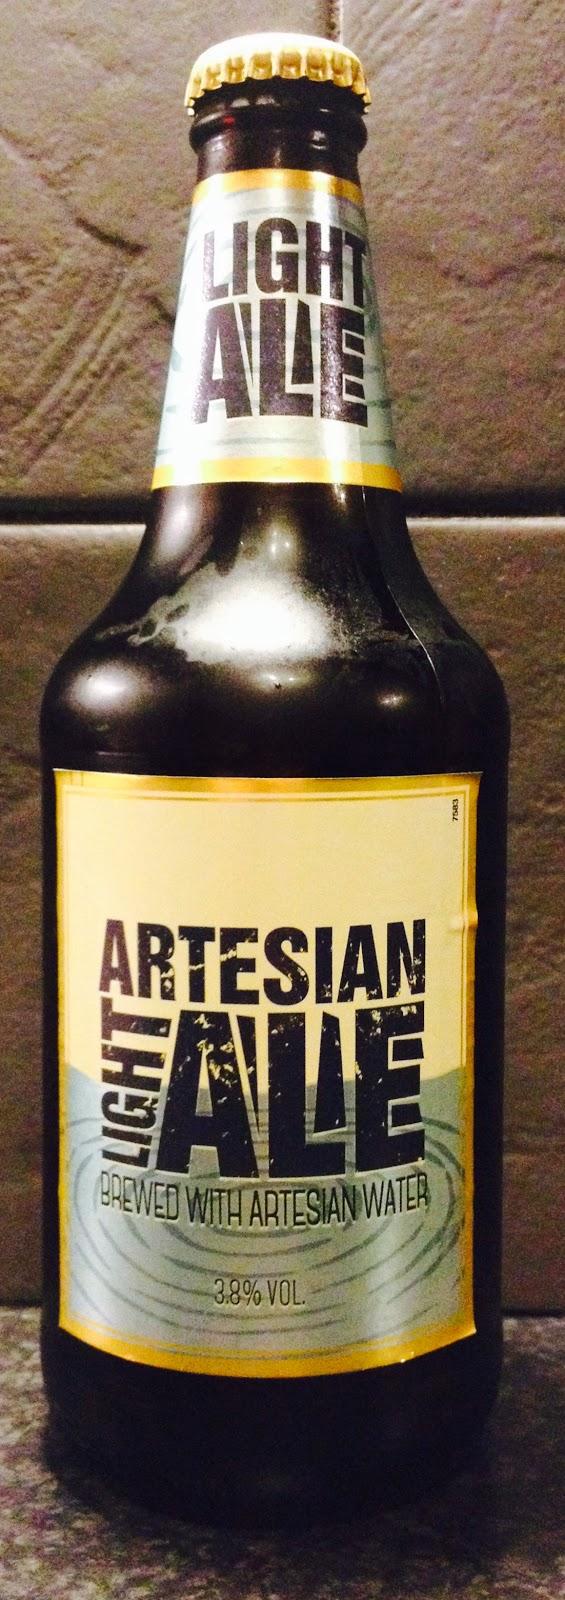 Artesian Light Ale (Shepherd Neame)